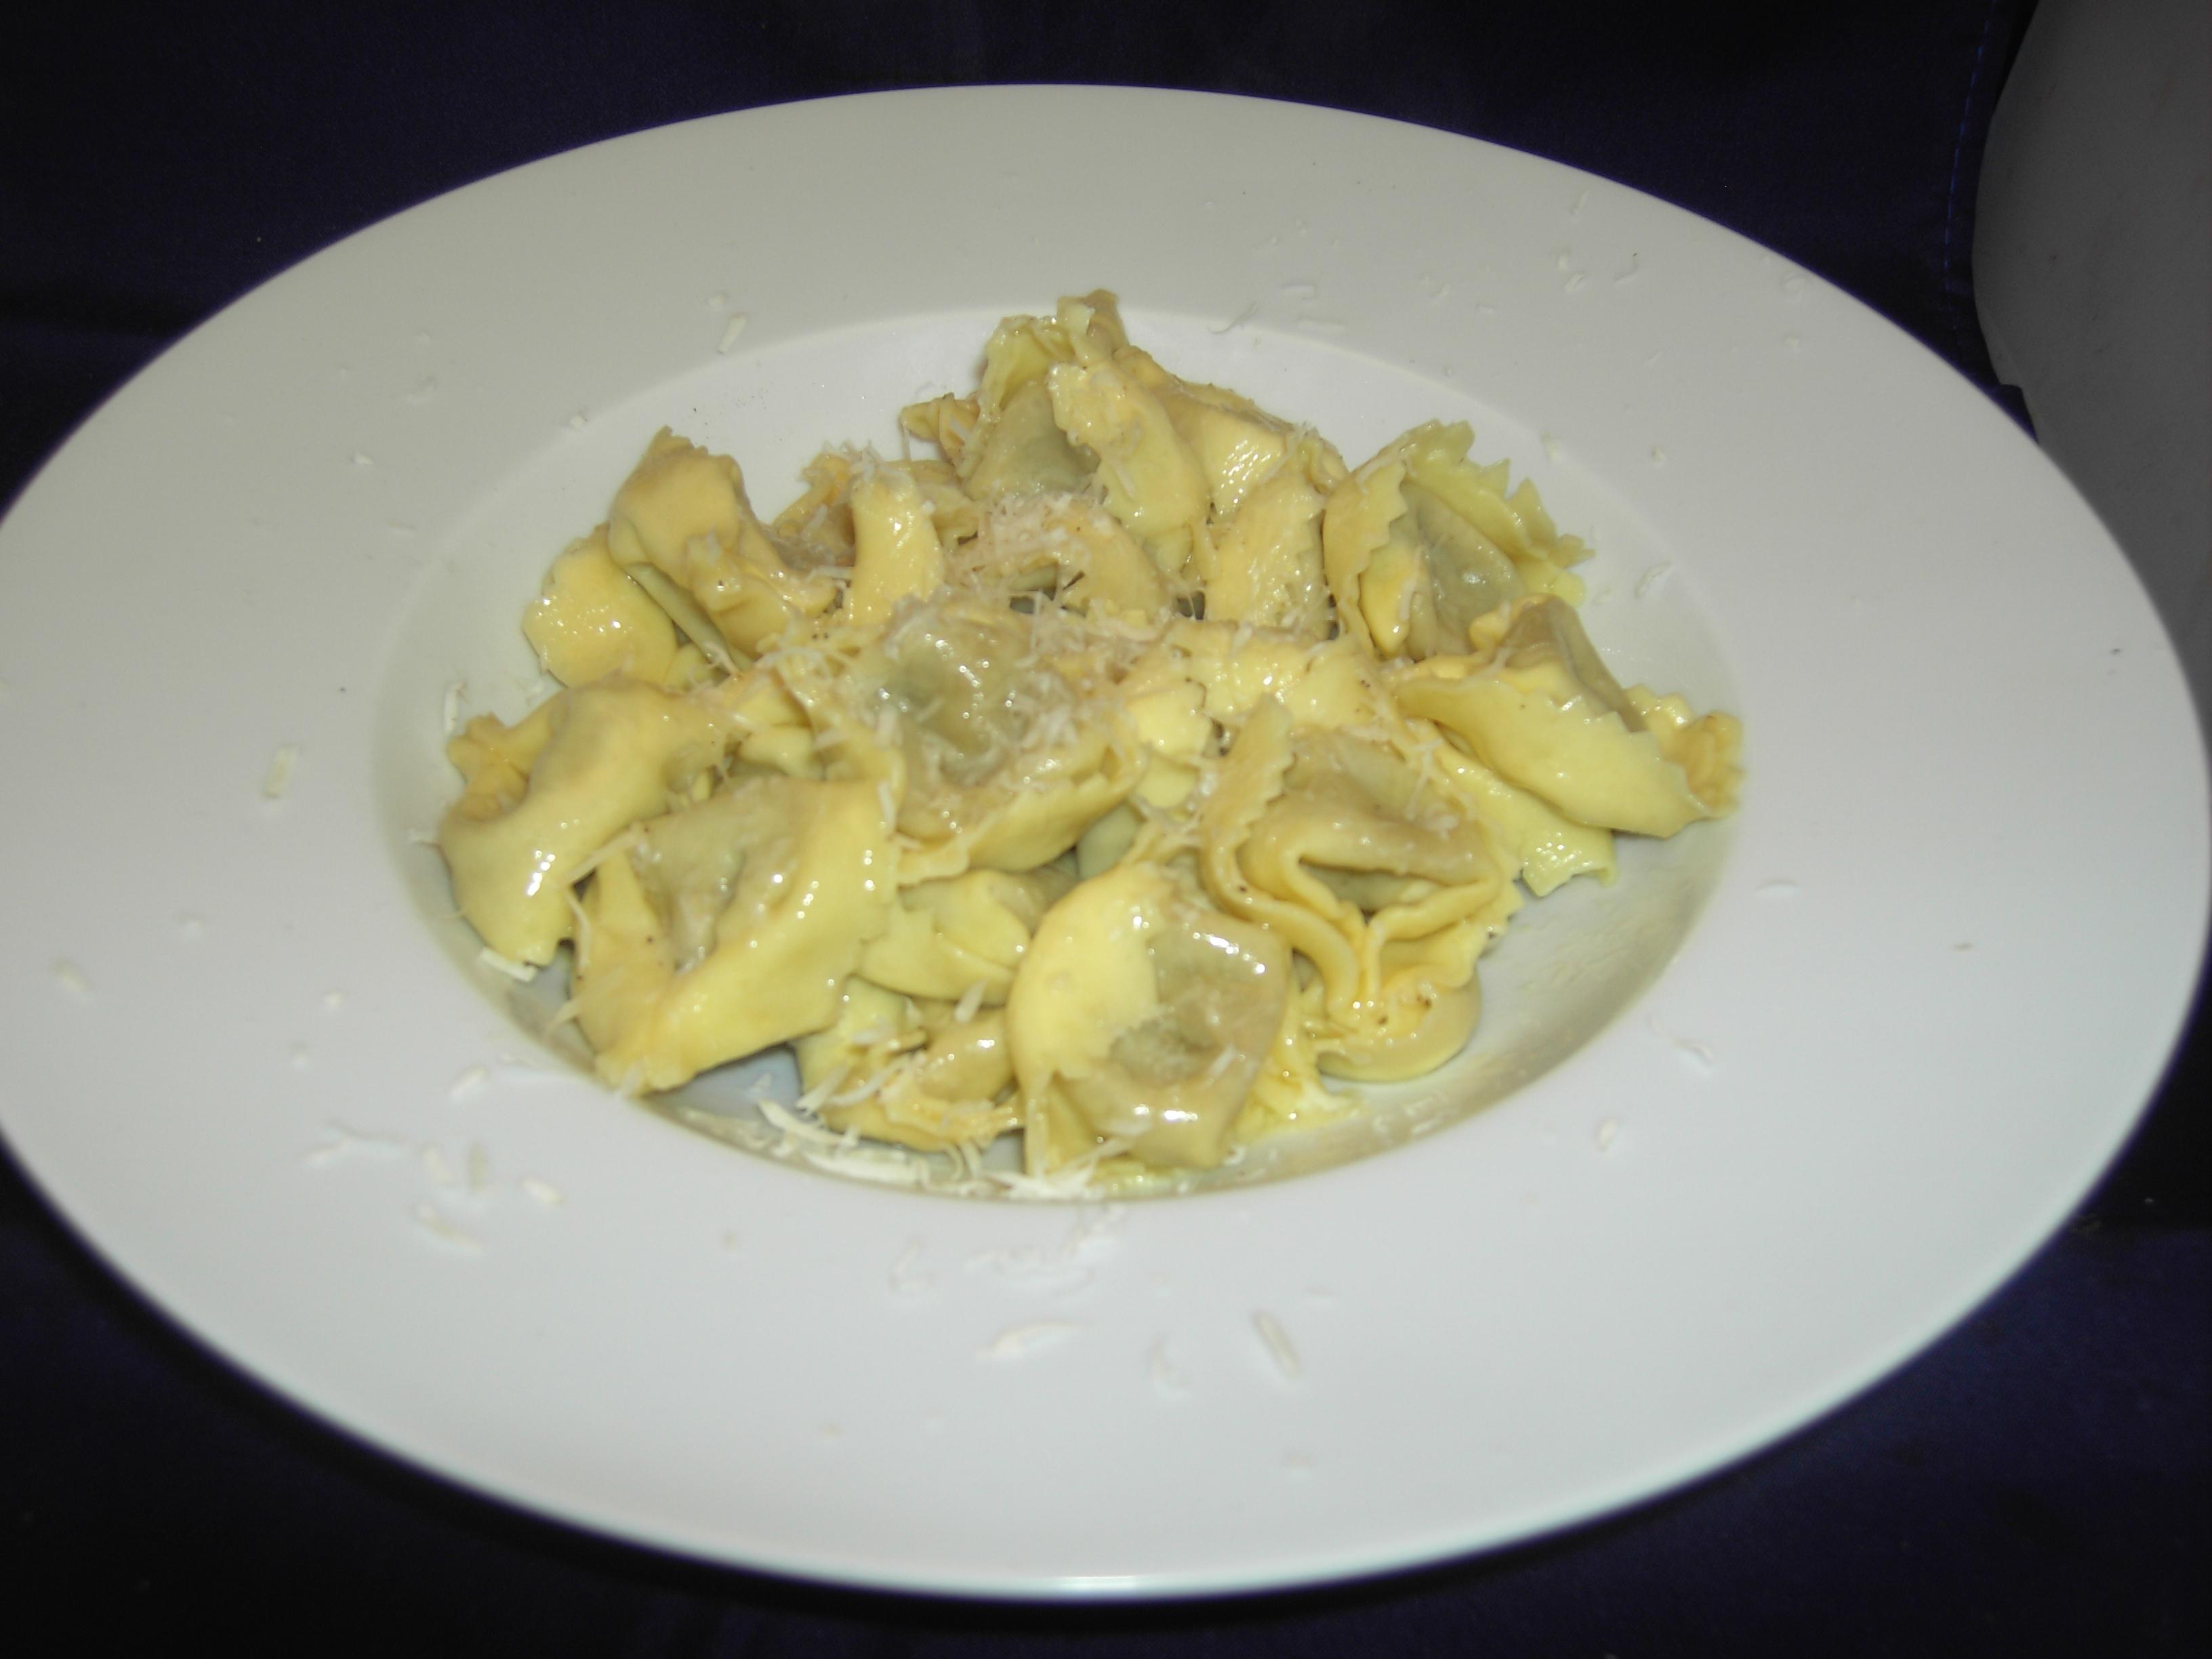 Tortelloni Funghi Porcini in Butter